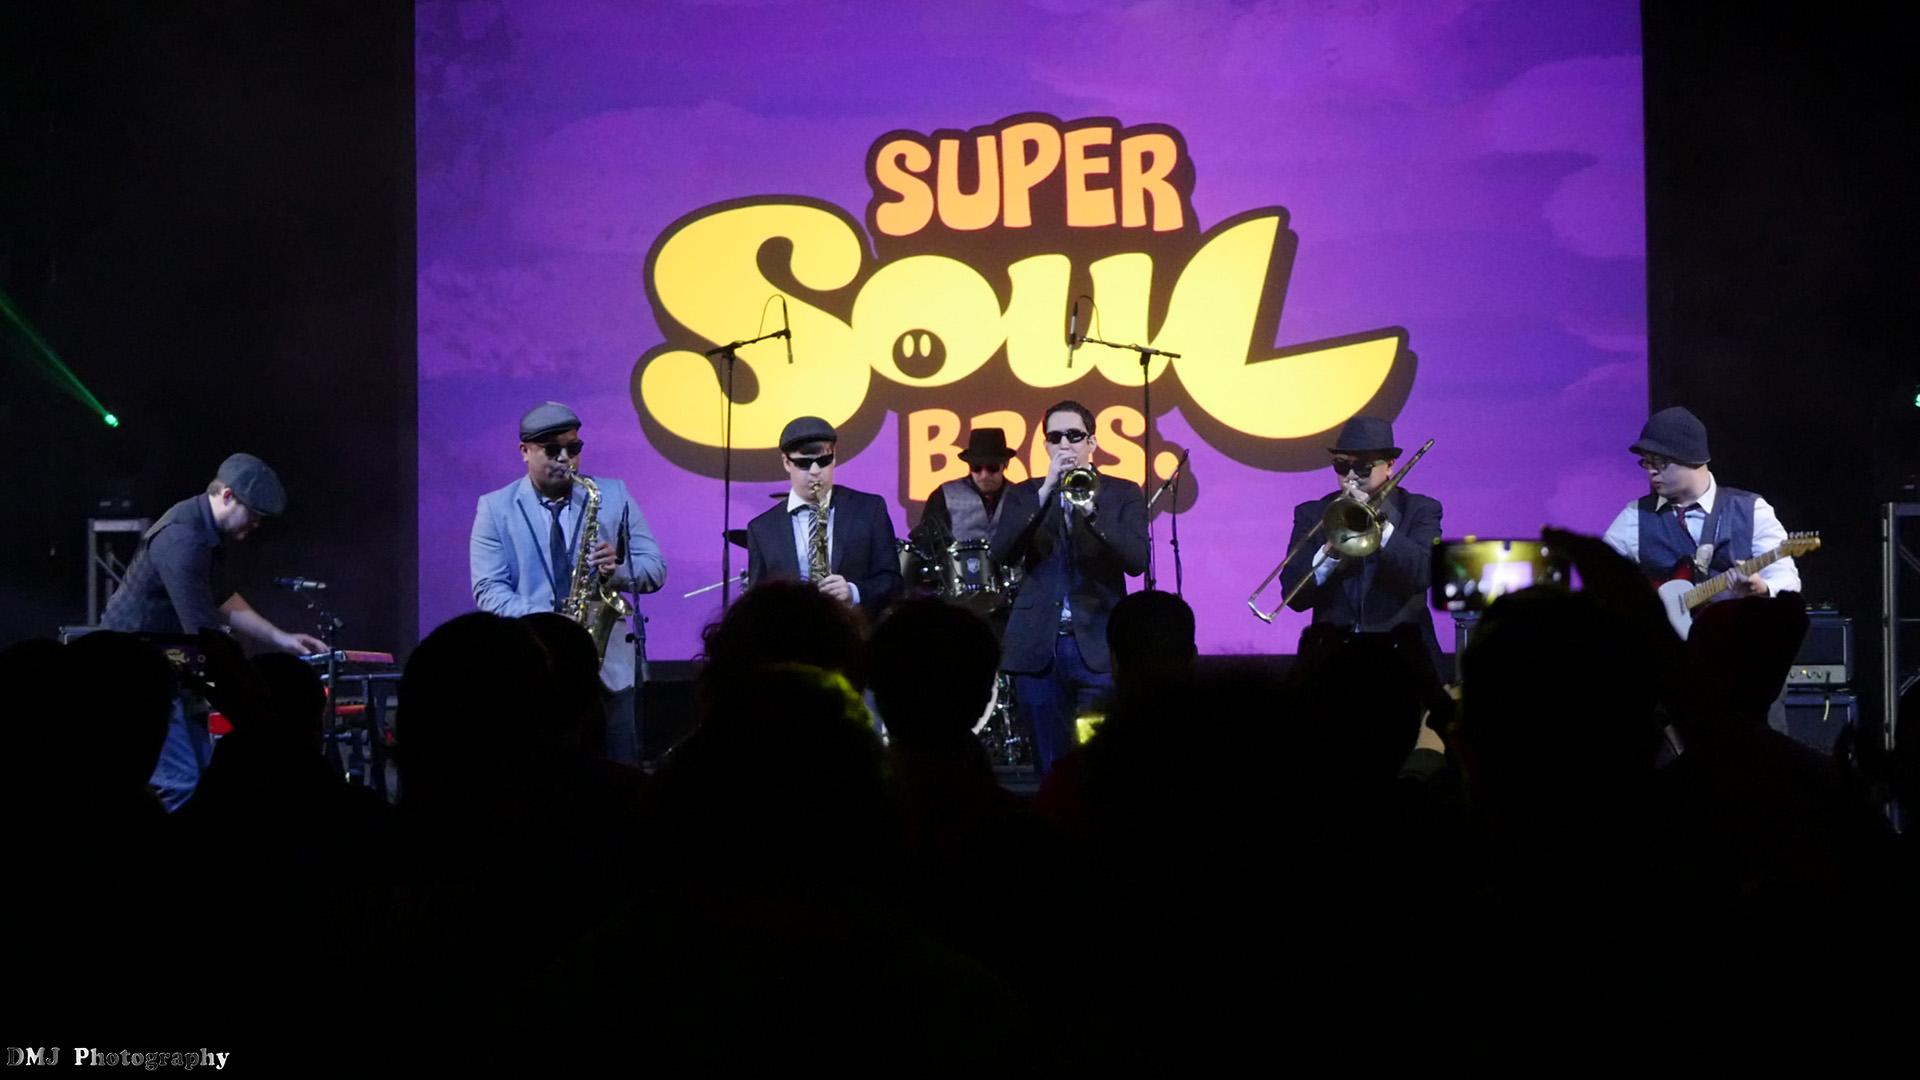 Super Soul Bros